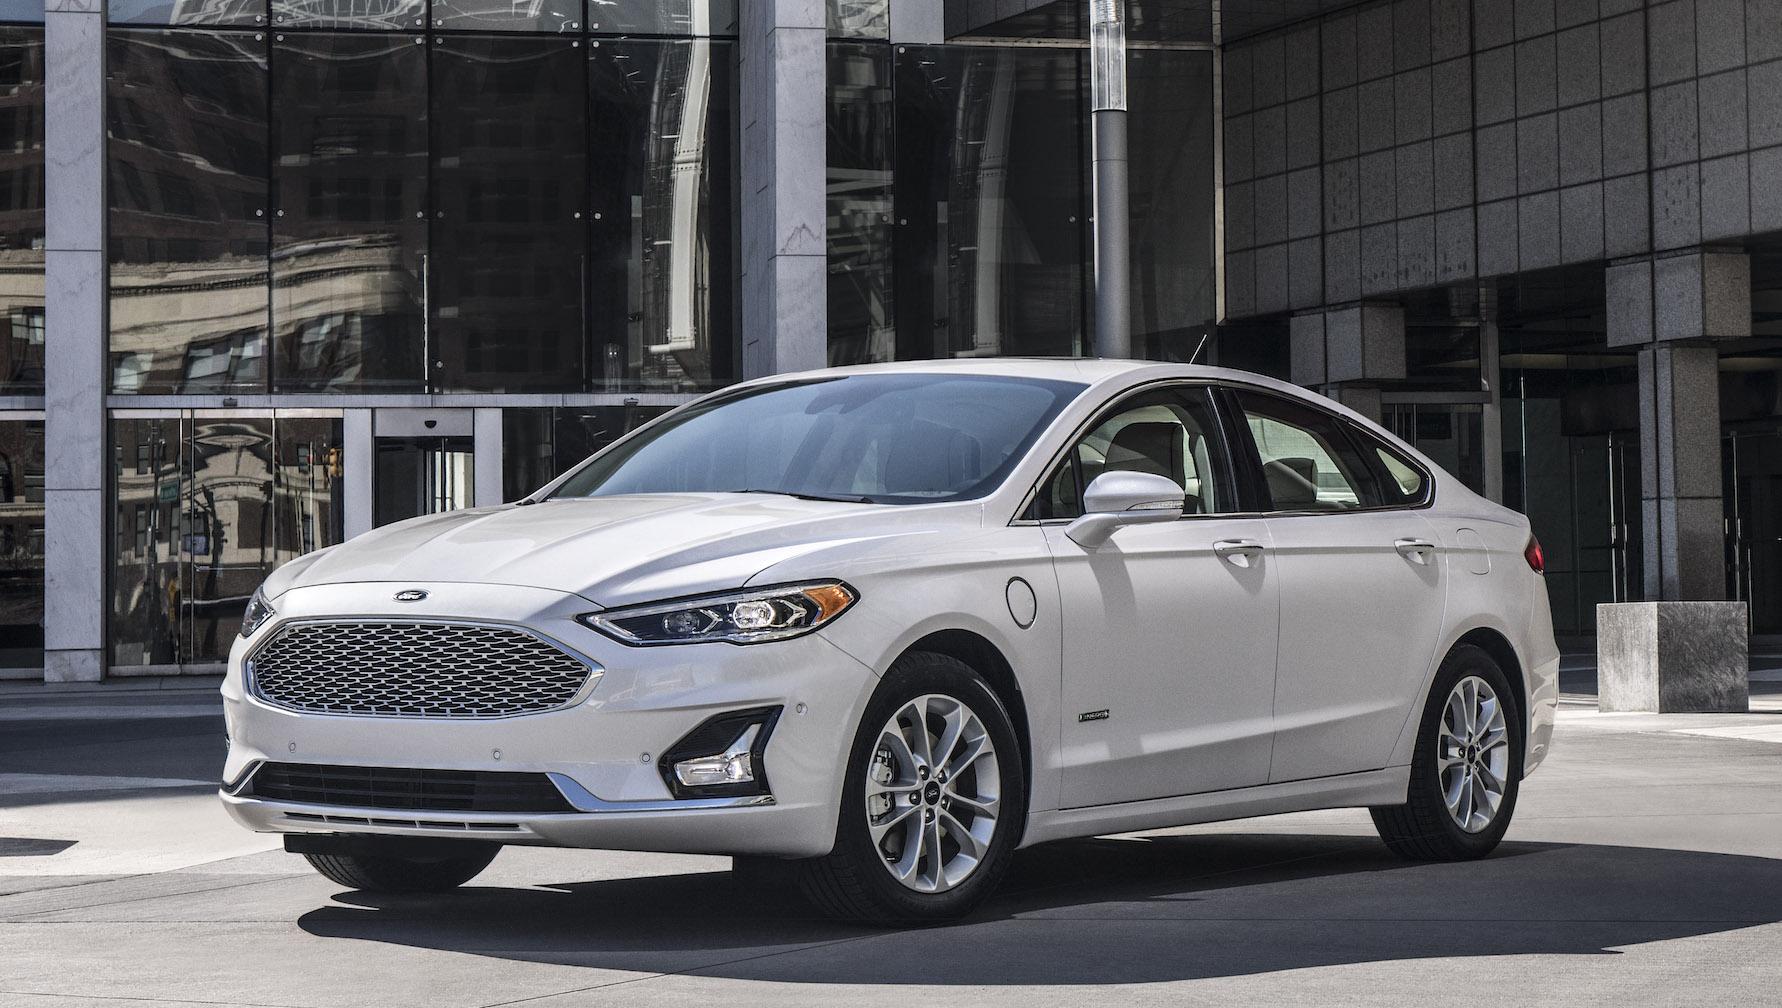 A white Ford Fusion Hybrid, a midsize sedan.